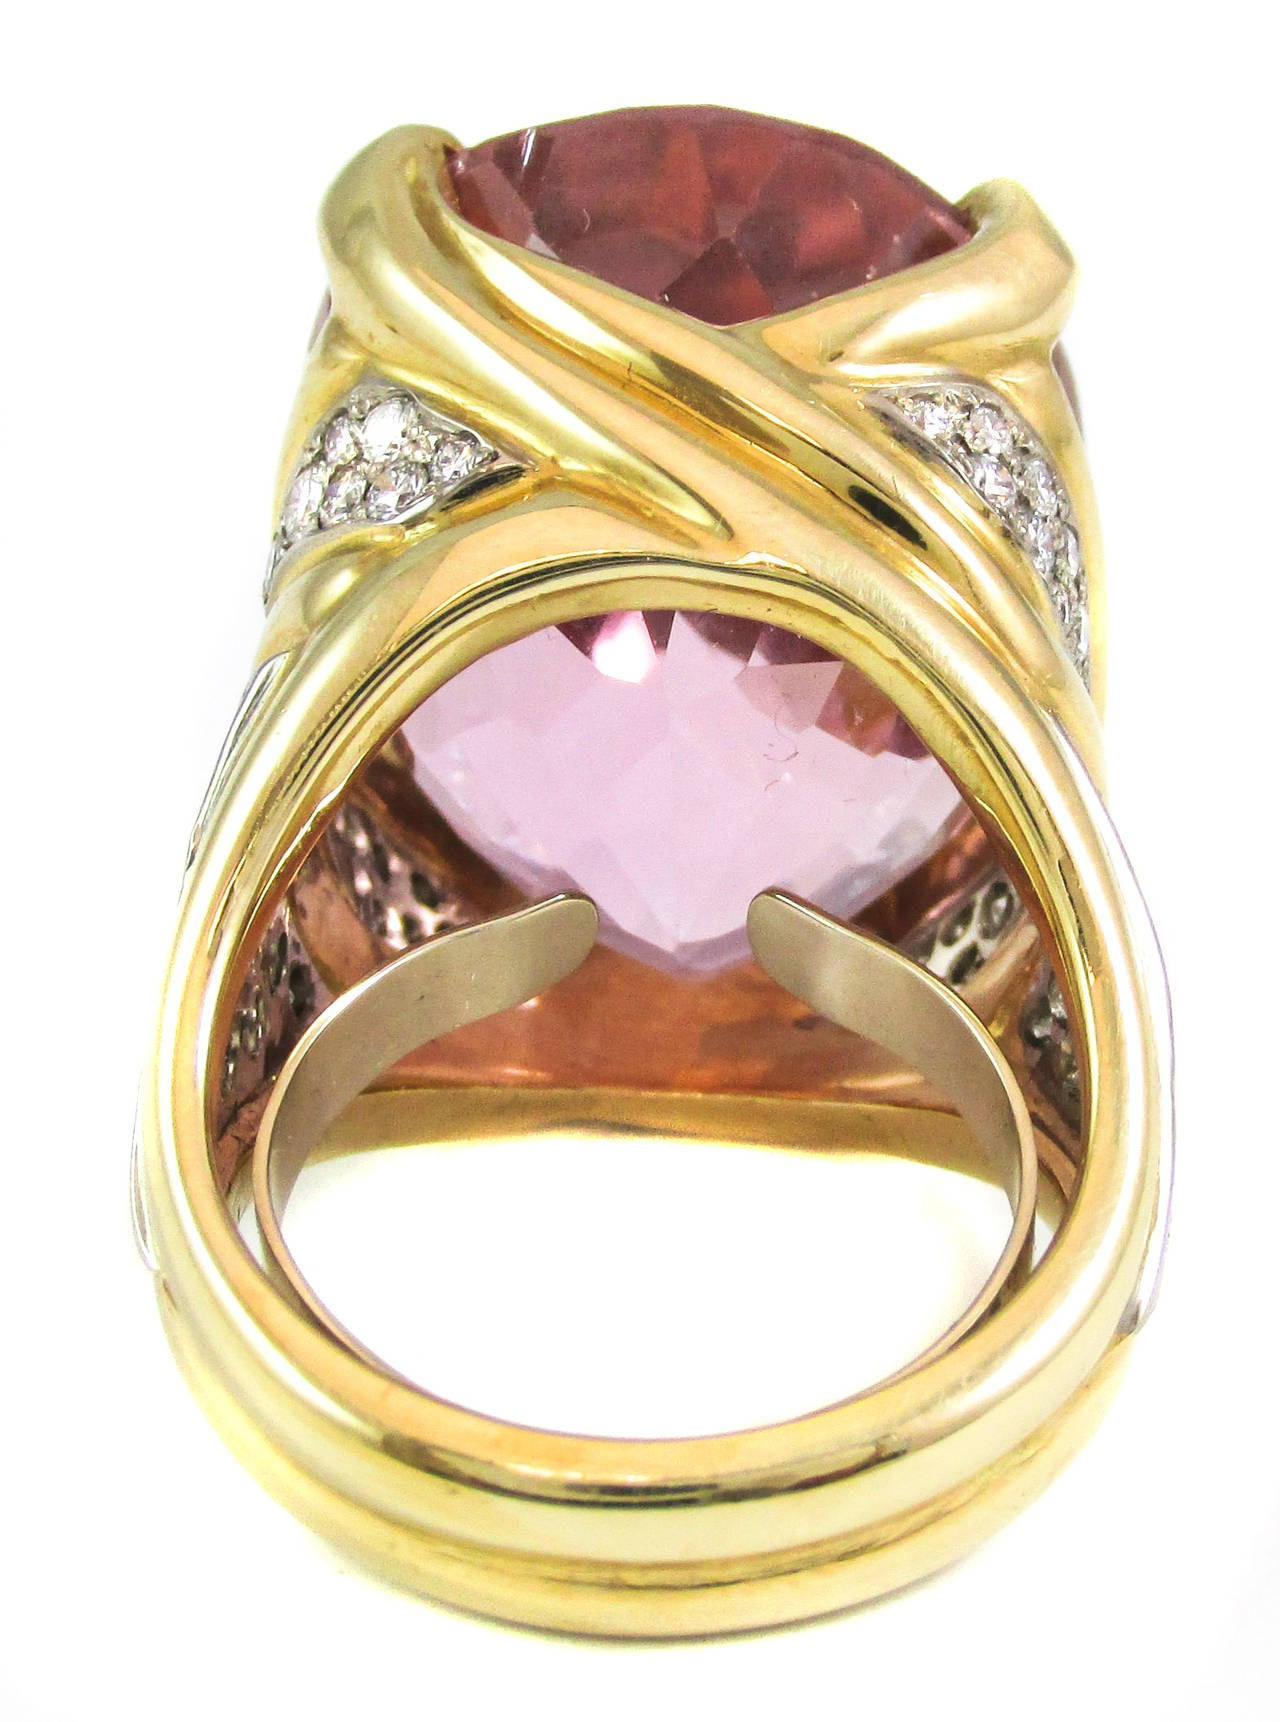 Impressive Rose Pink 50 Carat Kunzite Diamond Ring For